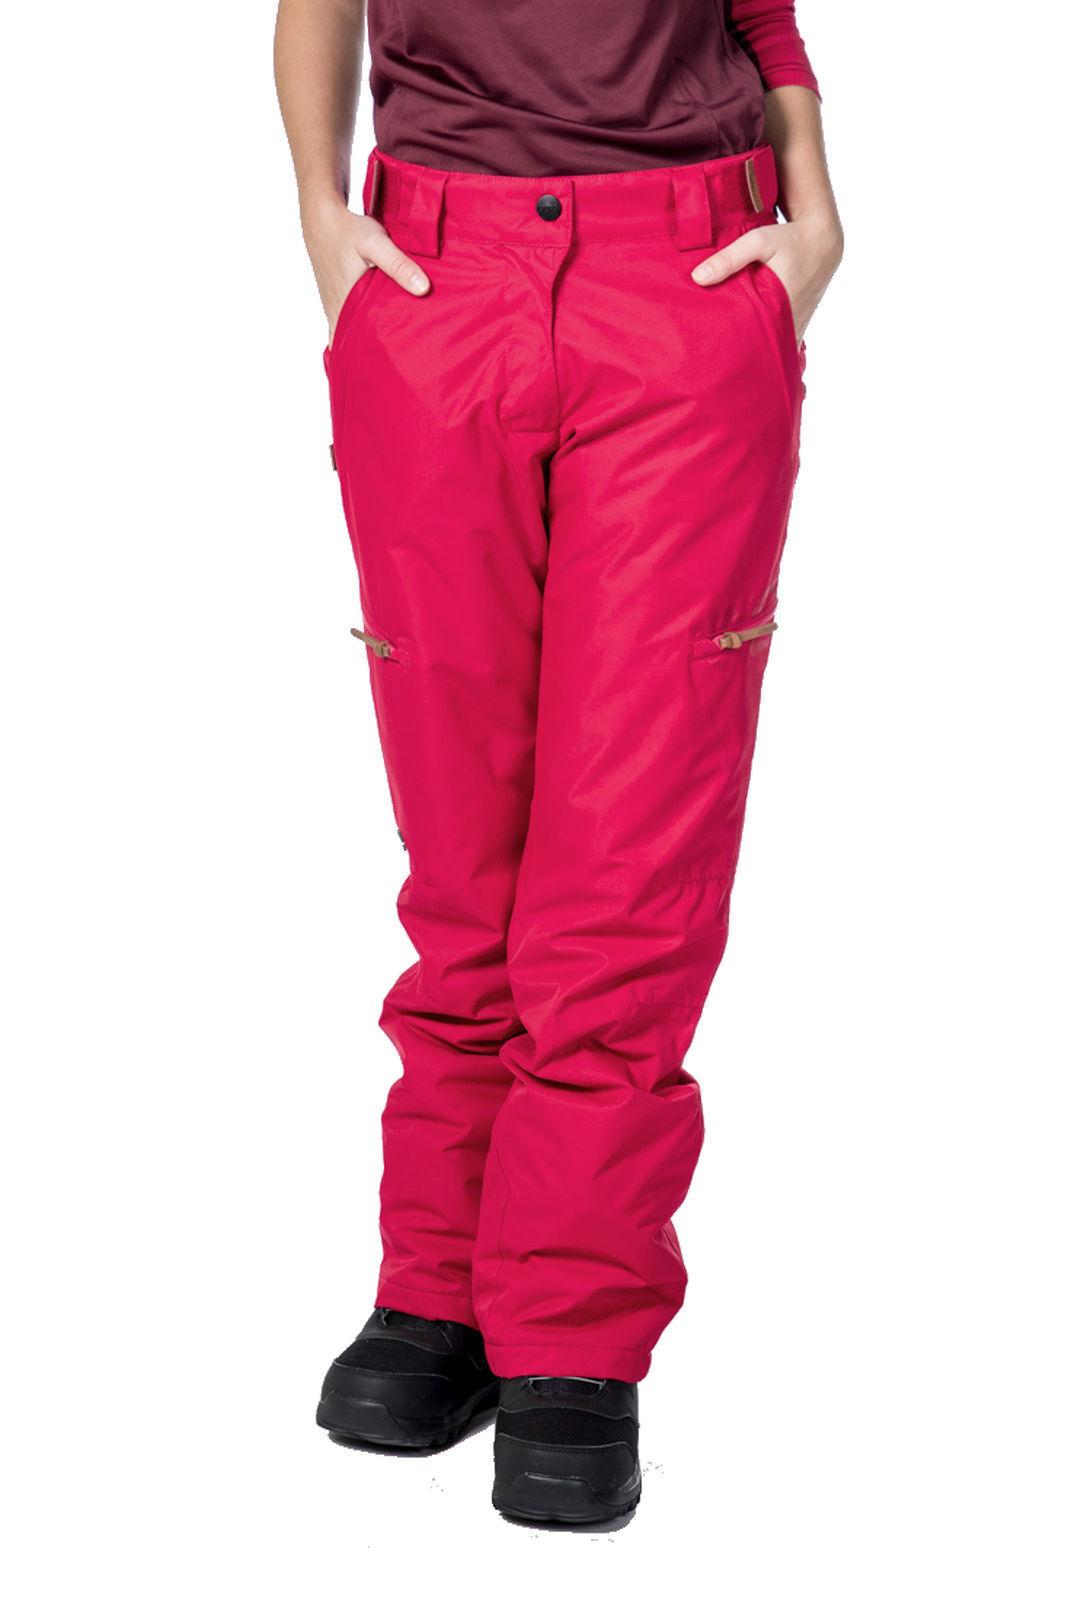 Csnrd Equí Mujer - Pantalones de Snowboard Kylie Pantalones Fucsia